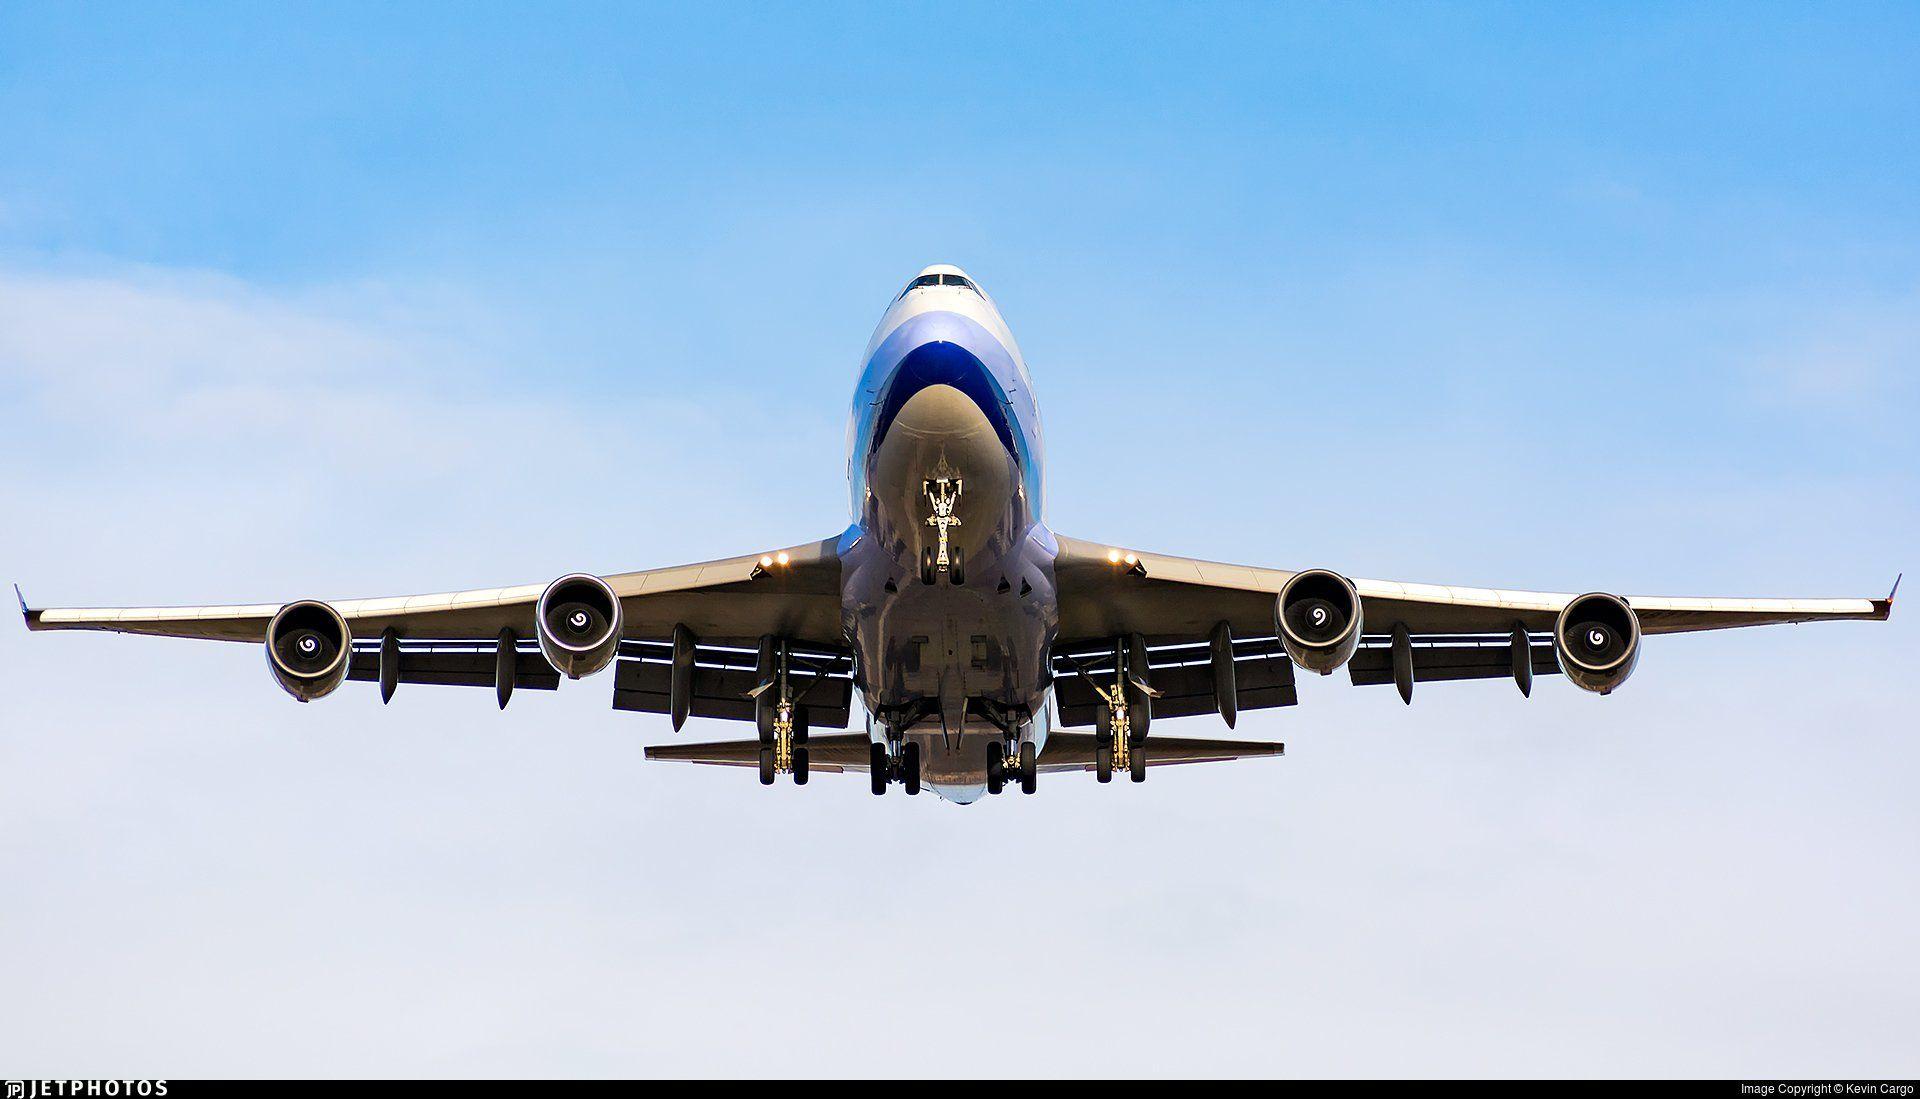 JetPhotosJetPhotos A China Airlines Cargo 747 landing